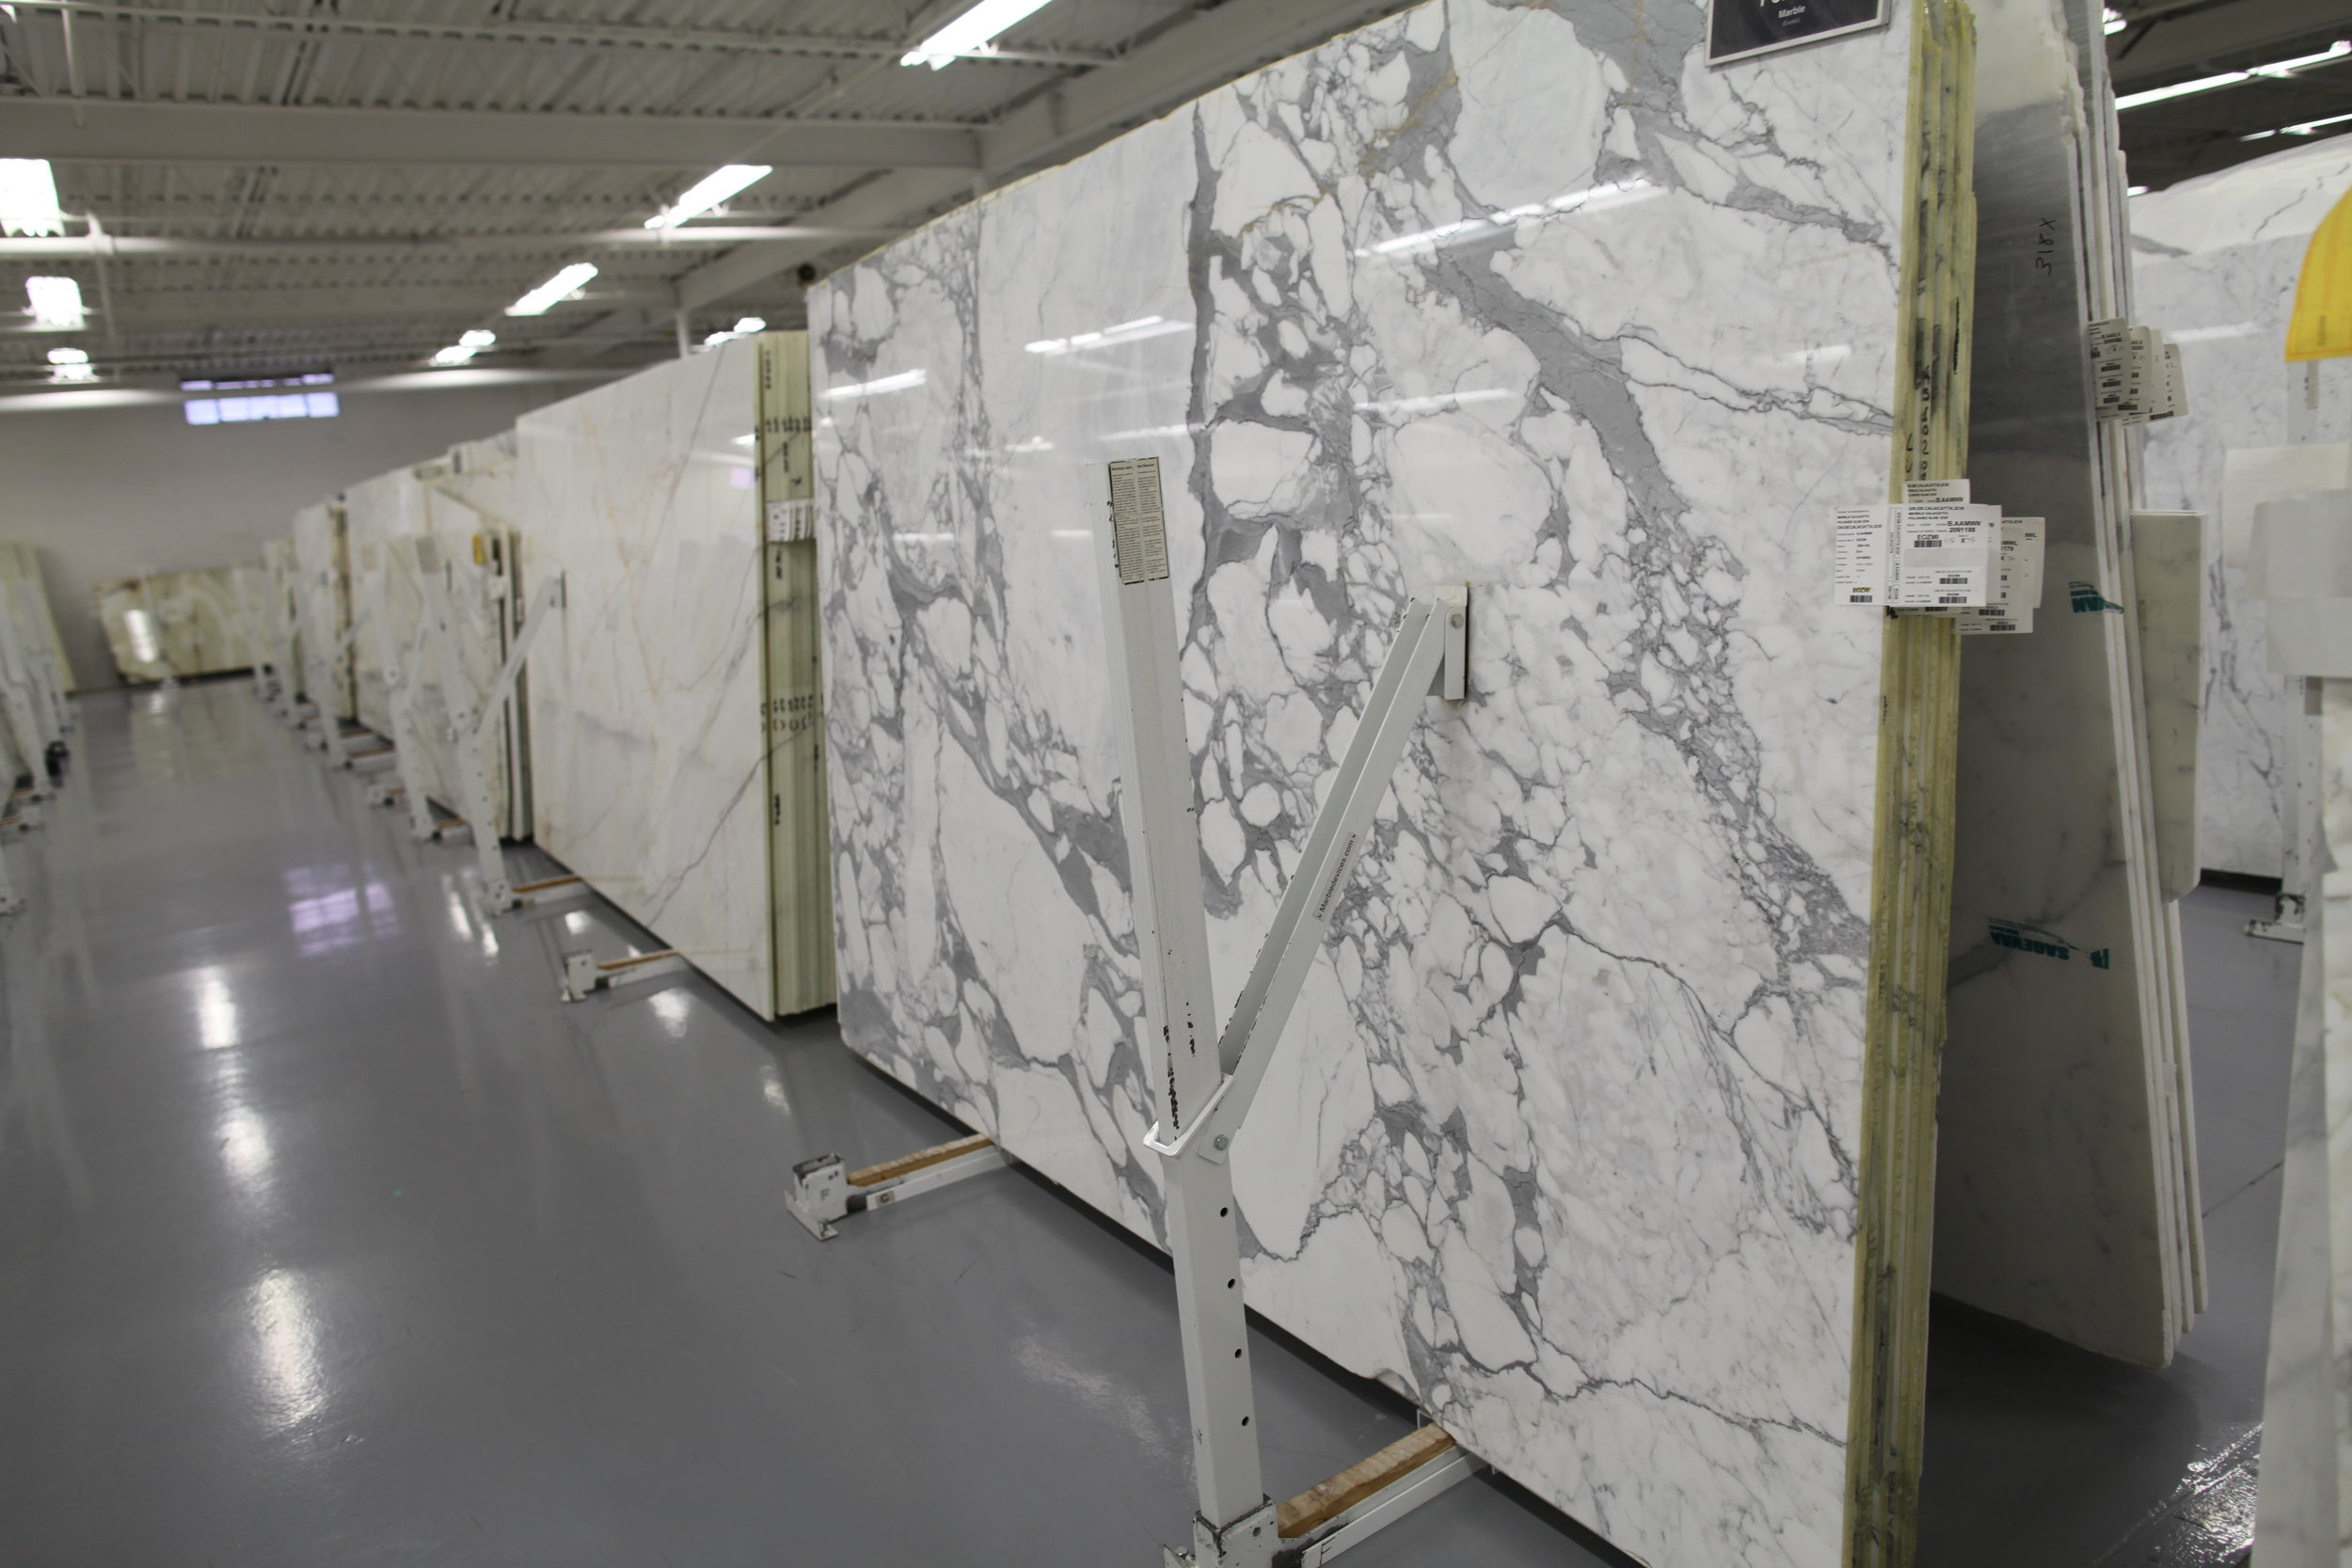 Calacatta marble at Olympia Tile & Slab.